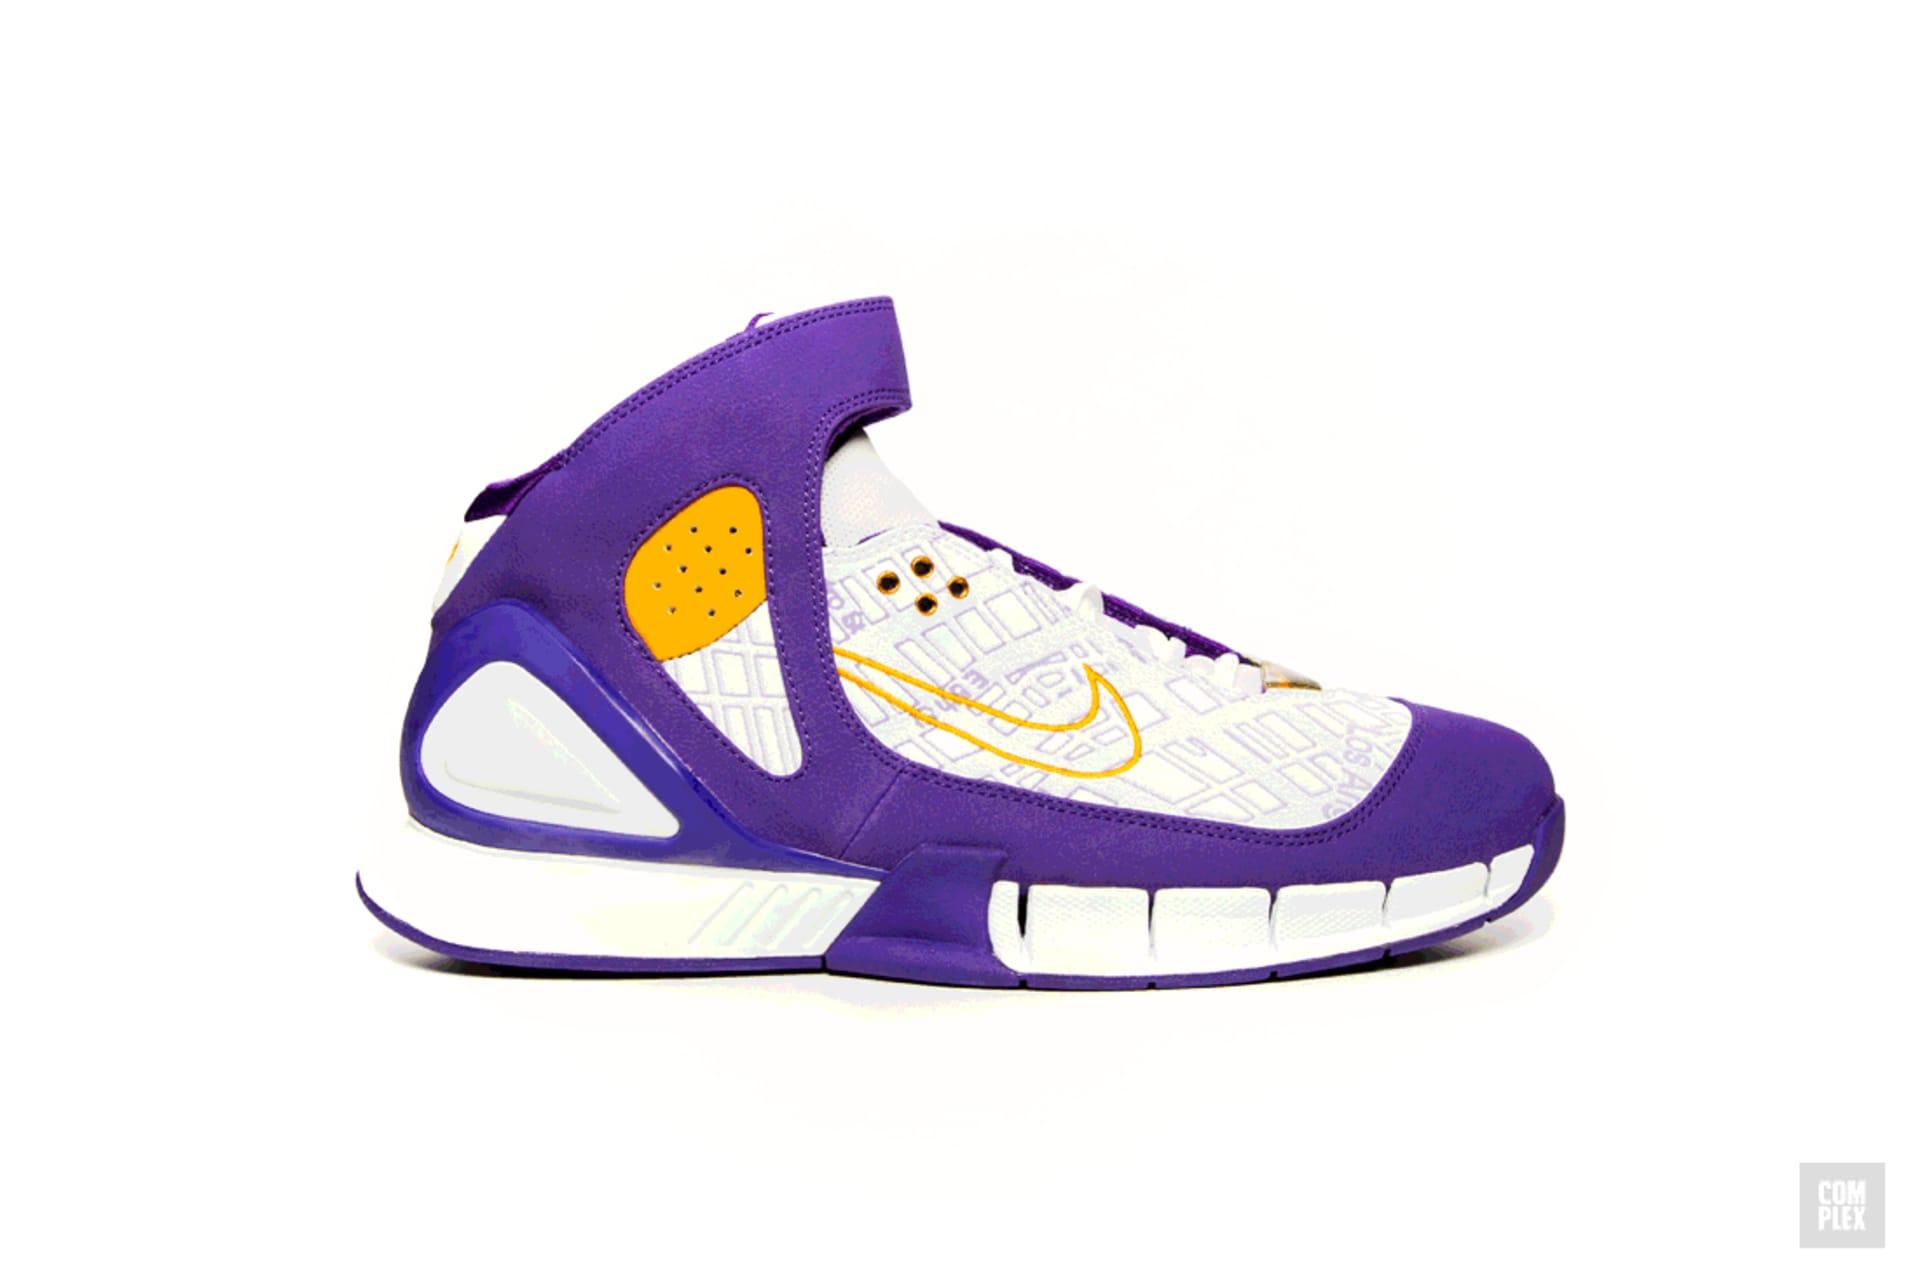 7ba3e0f22f41 Kobe Bryant Signature Sneaker Design Evolution